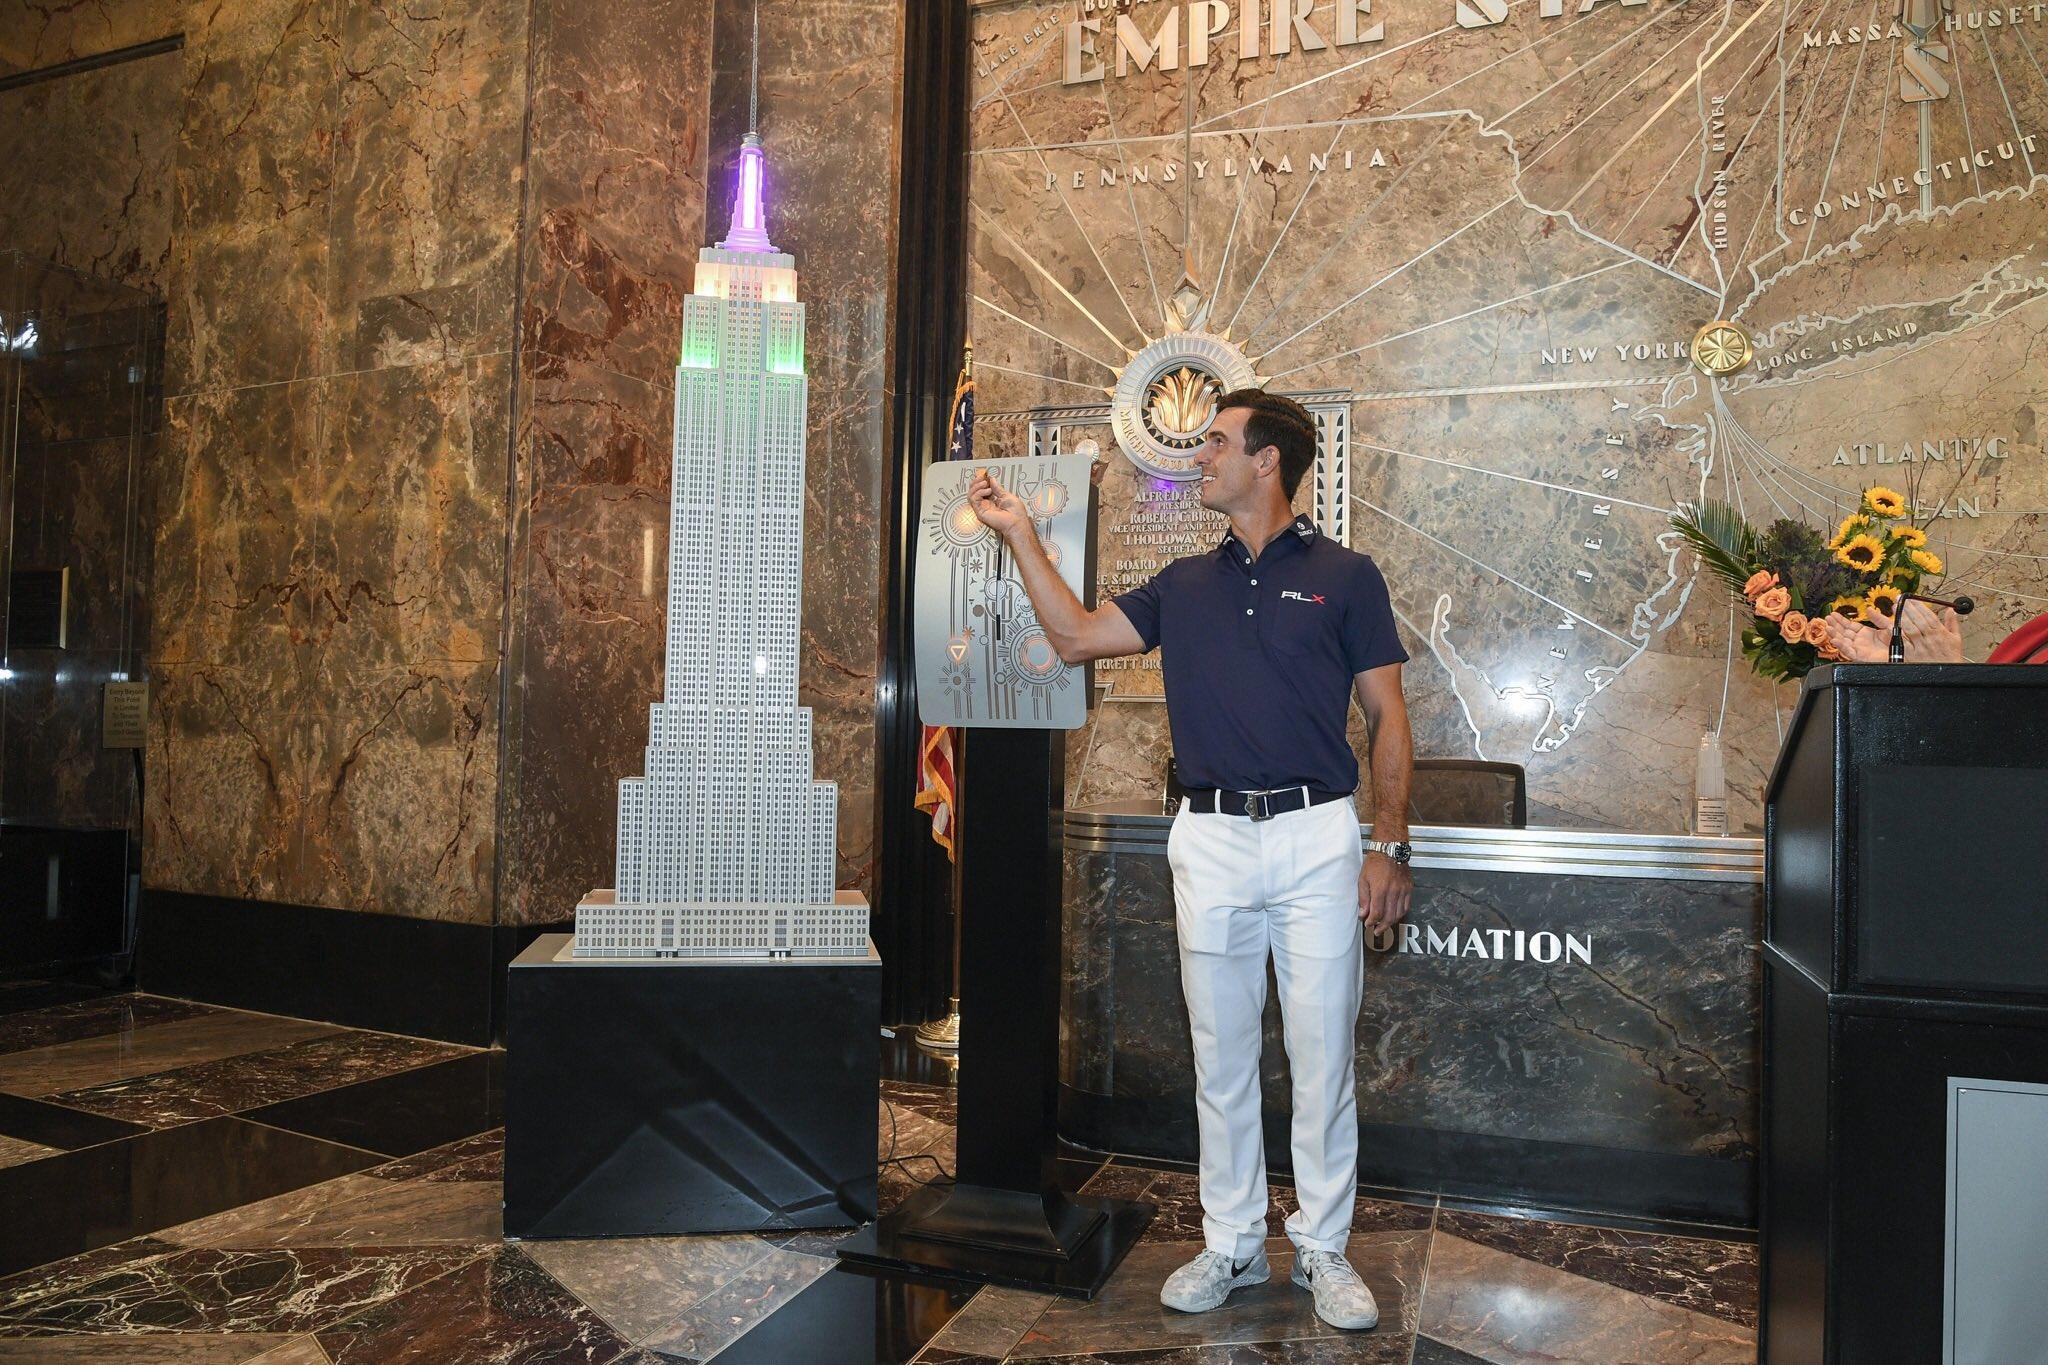 Billy Horschel, en el Empire State Building © PGA Tour